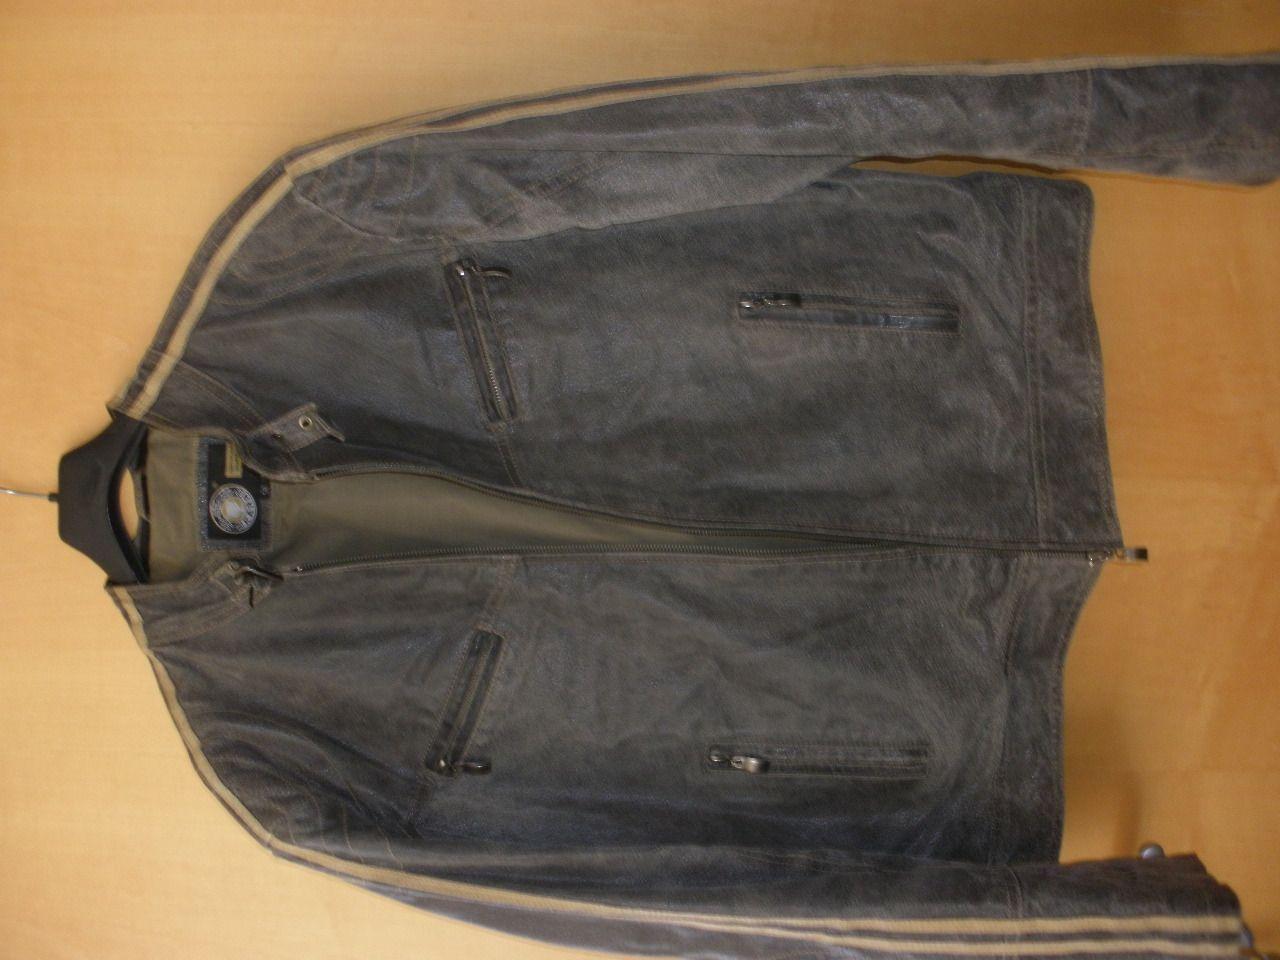 31bb6e506 pánská kožená bunda - bazoš, bazar, inzerce